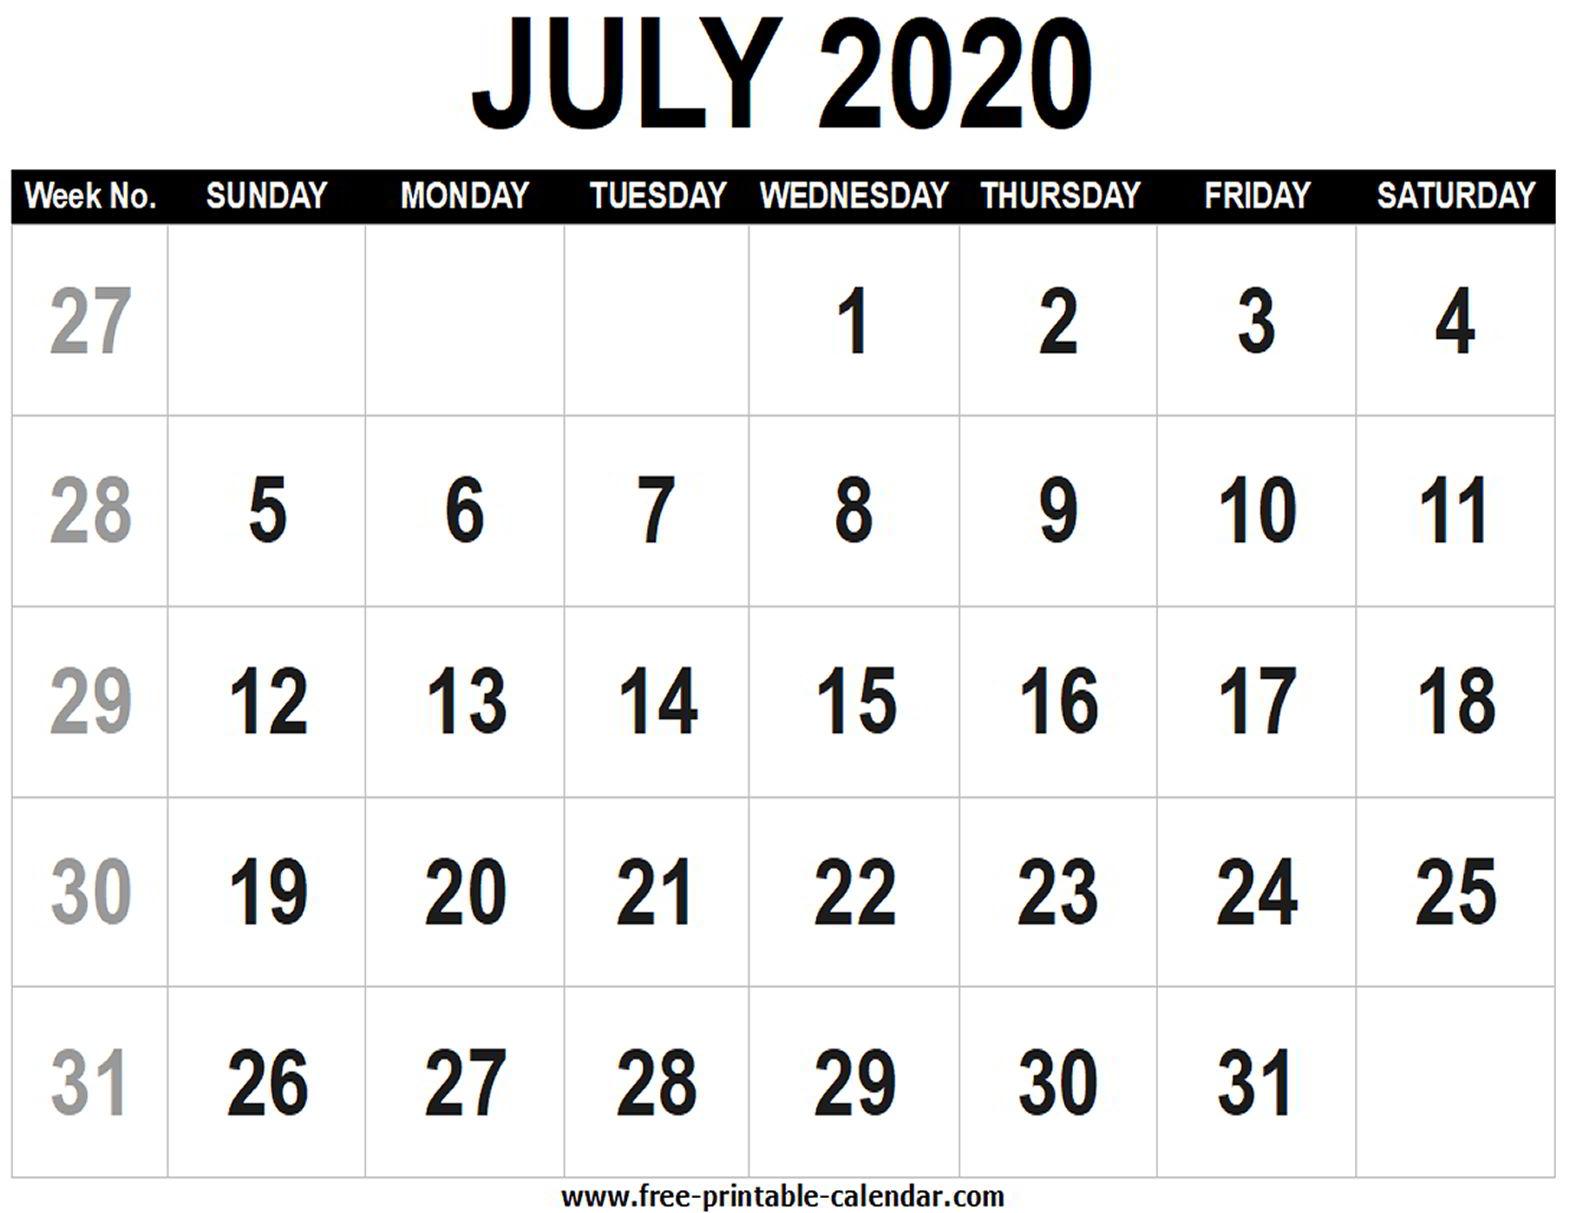 Blank Calendar 2020 July - Free-Printable-Calendar